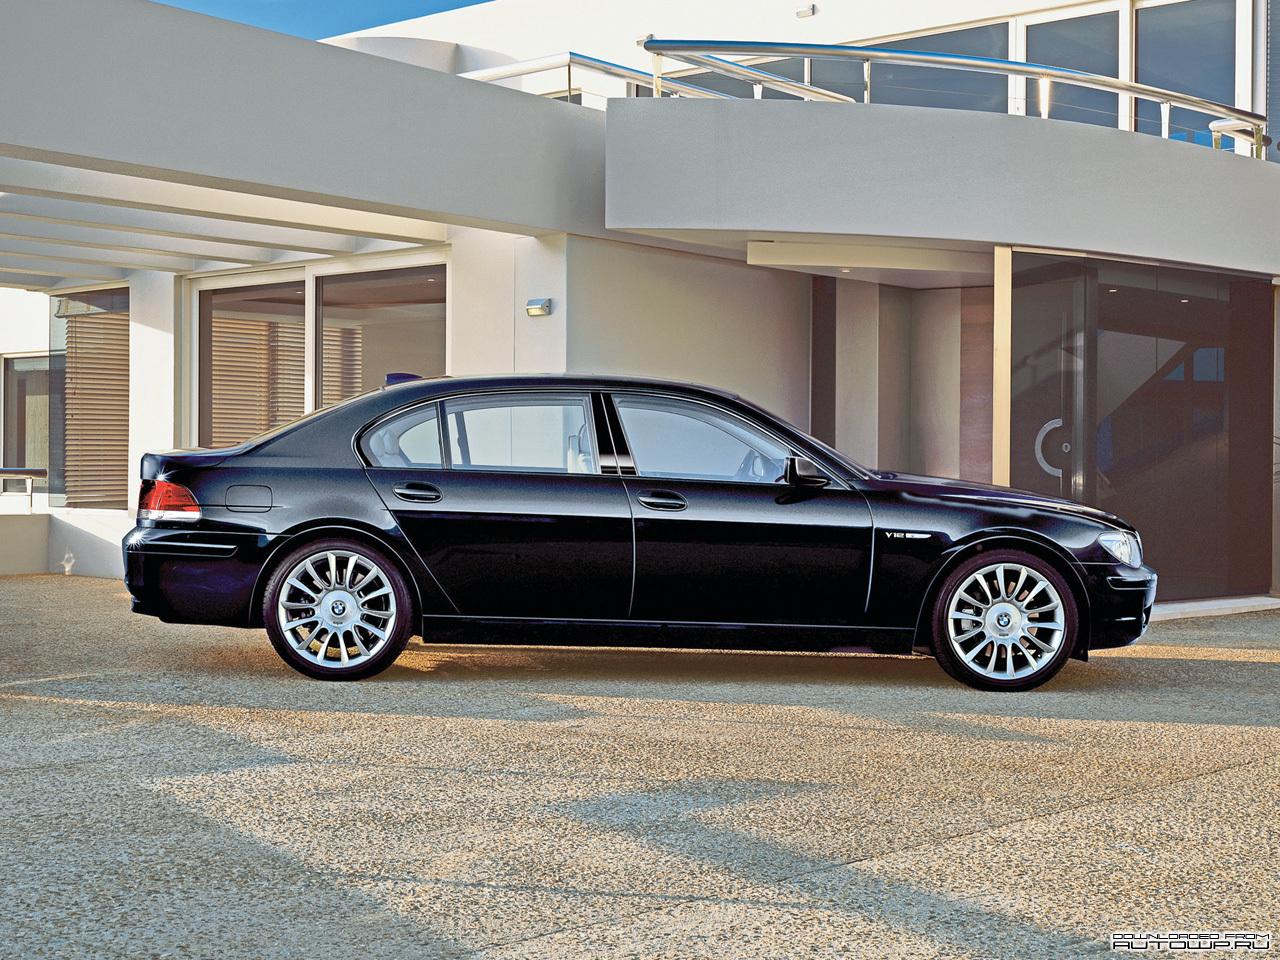 BMW 7-series E65 E66 photos - PhotoGallery with 109 pics ...